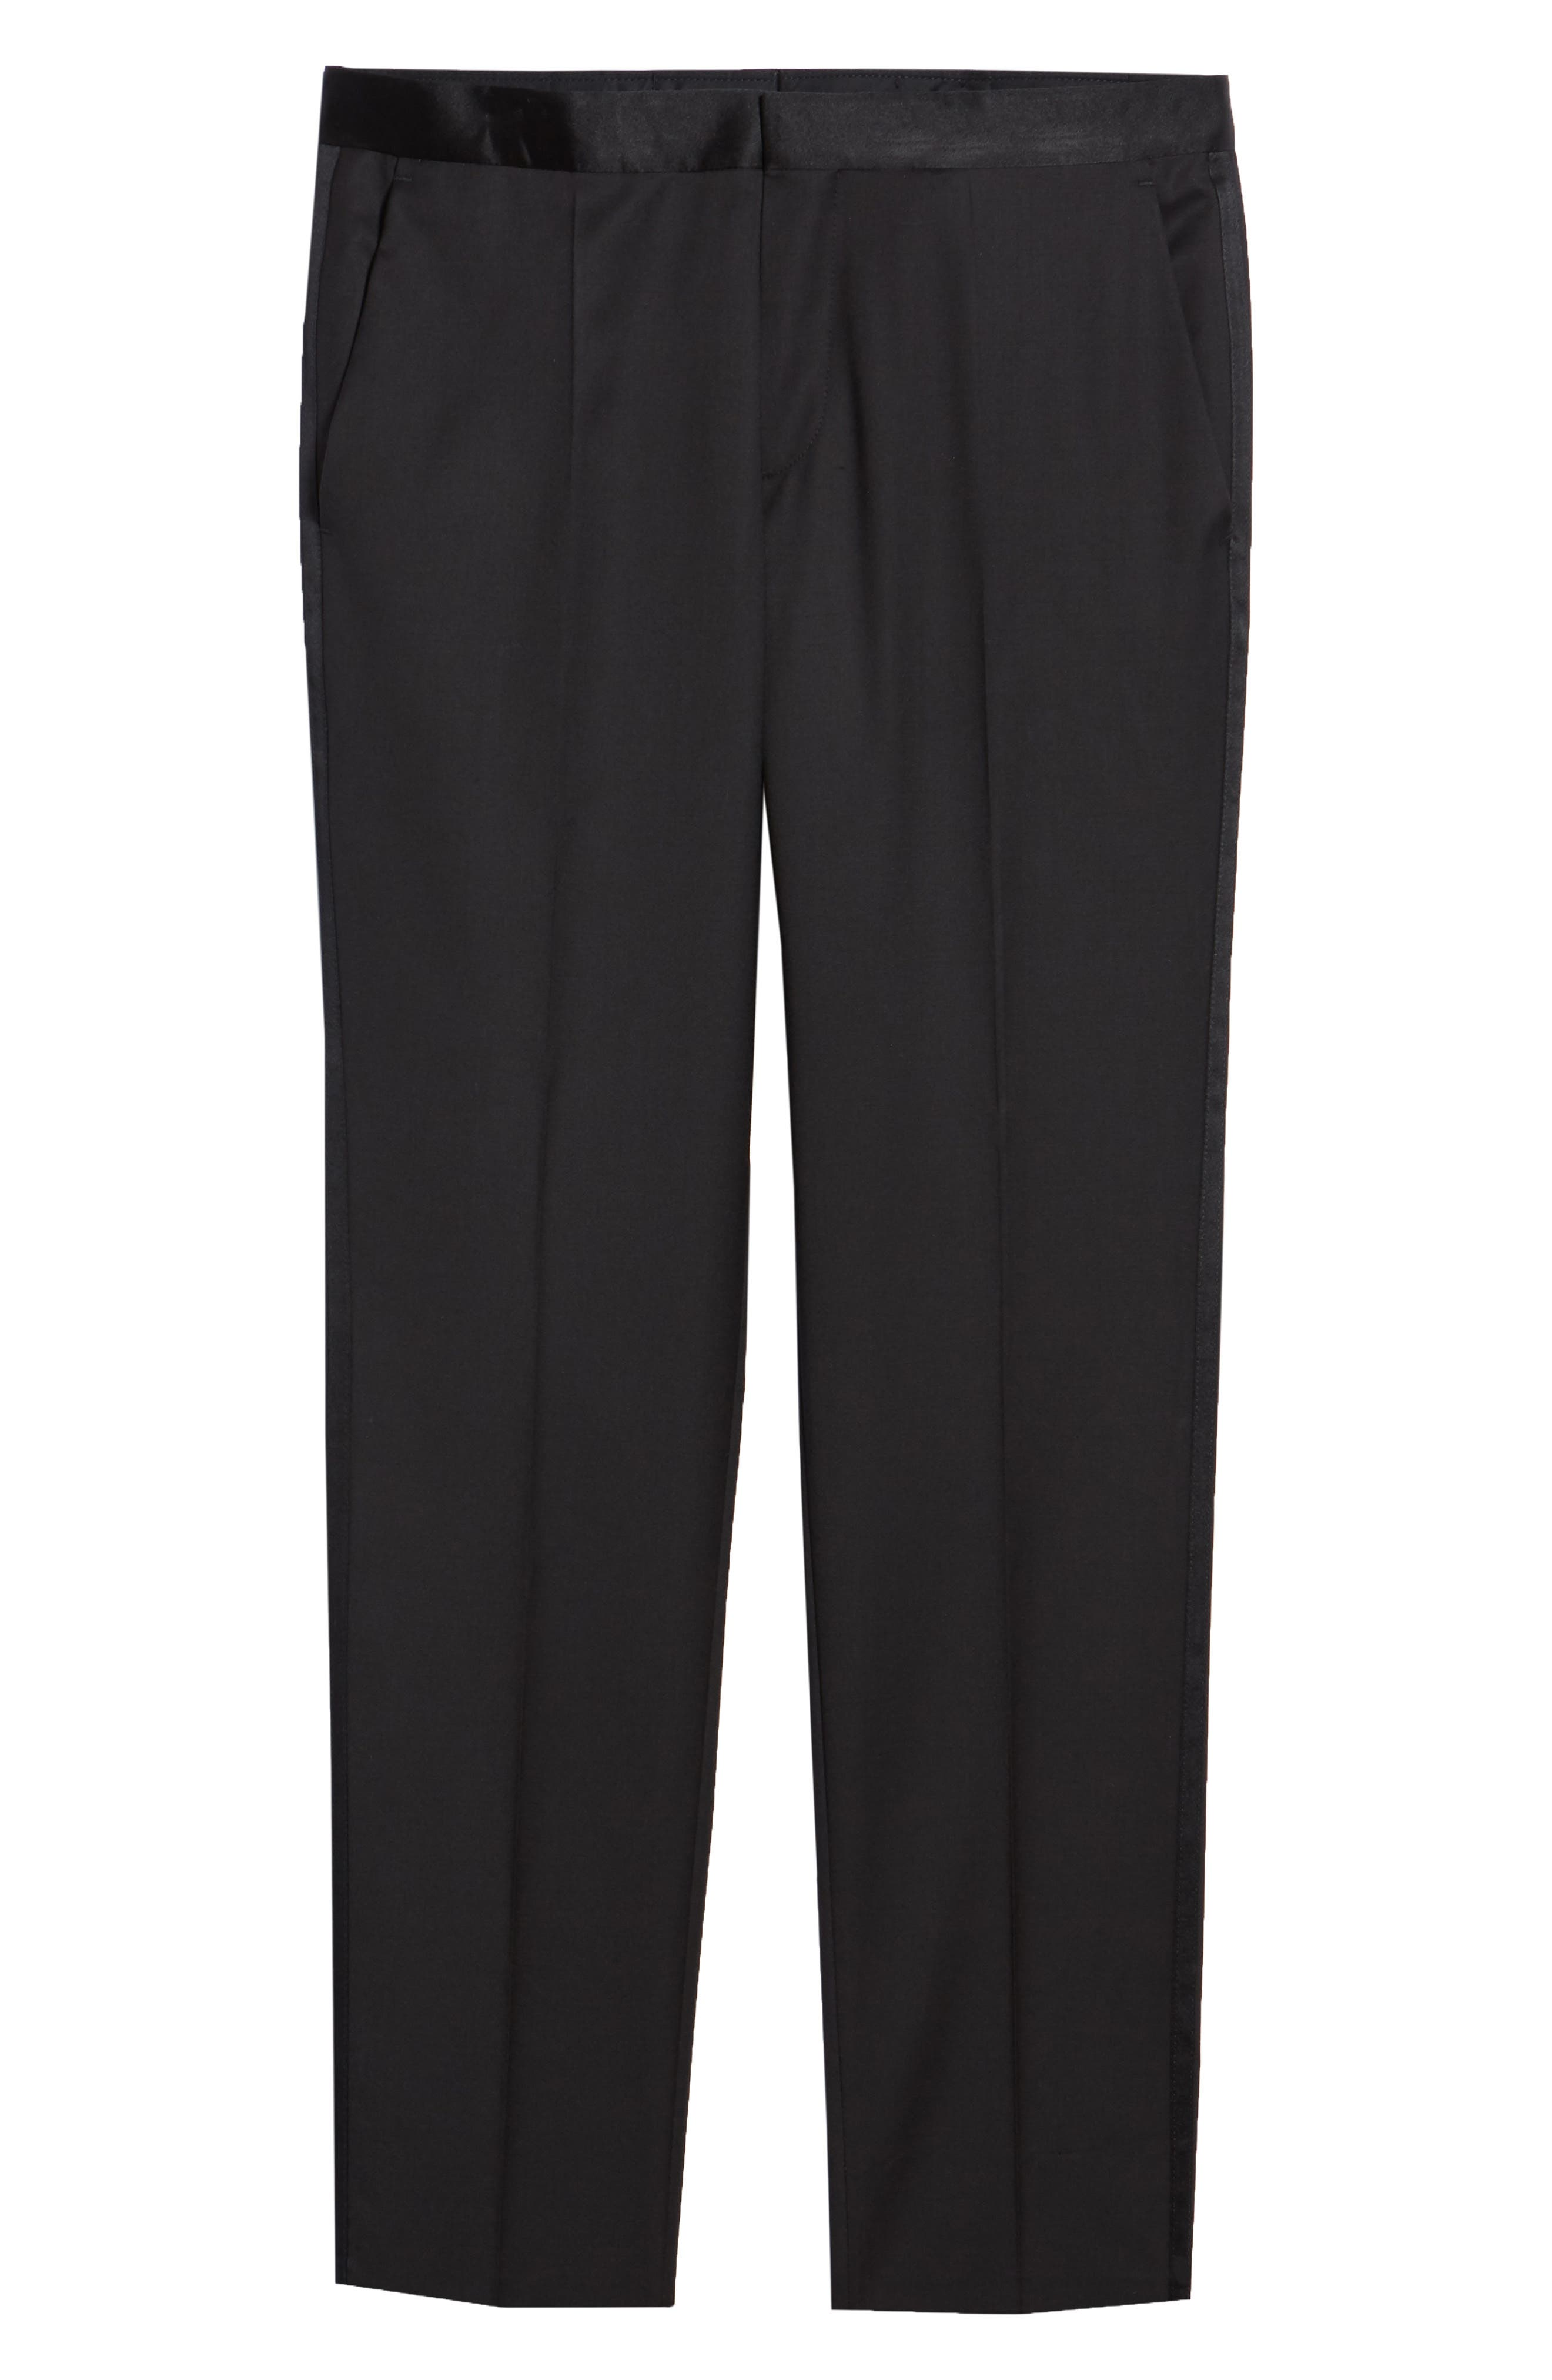 Josh Flat Front Wool & Mohair Tuxedo Pants,                             Alternate thumbnail 6, color,                             BLACK